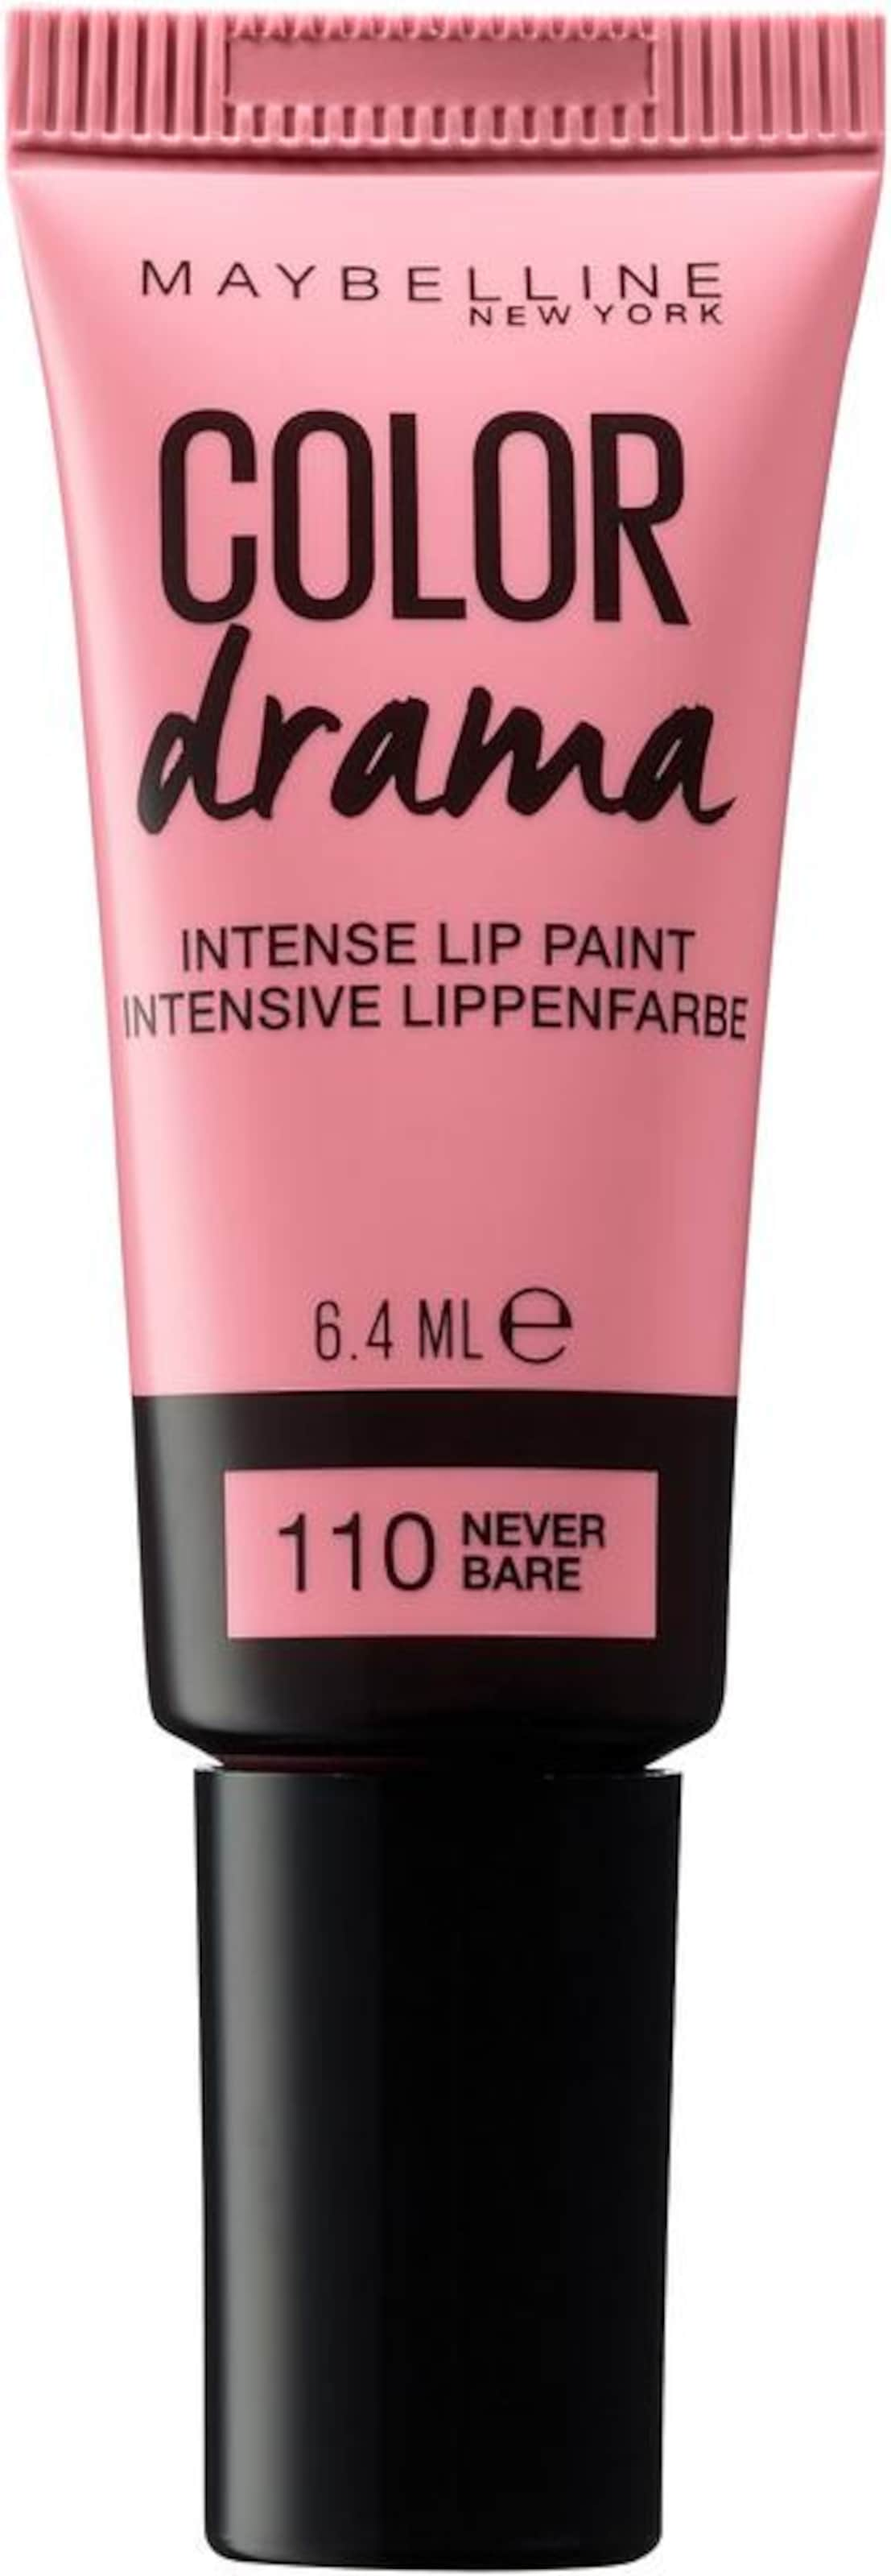 Maybelline New Pink Drama 'lipstudio York In Color Lippenstift'Lippenstift QxoBECderW